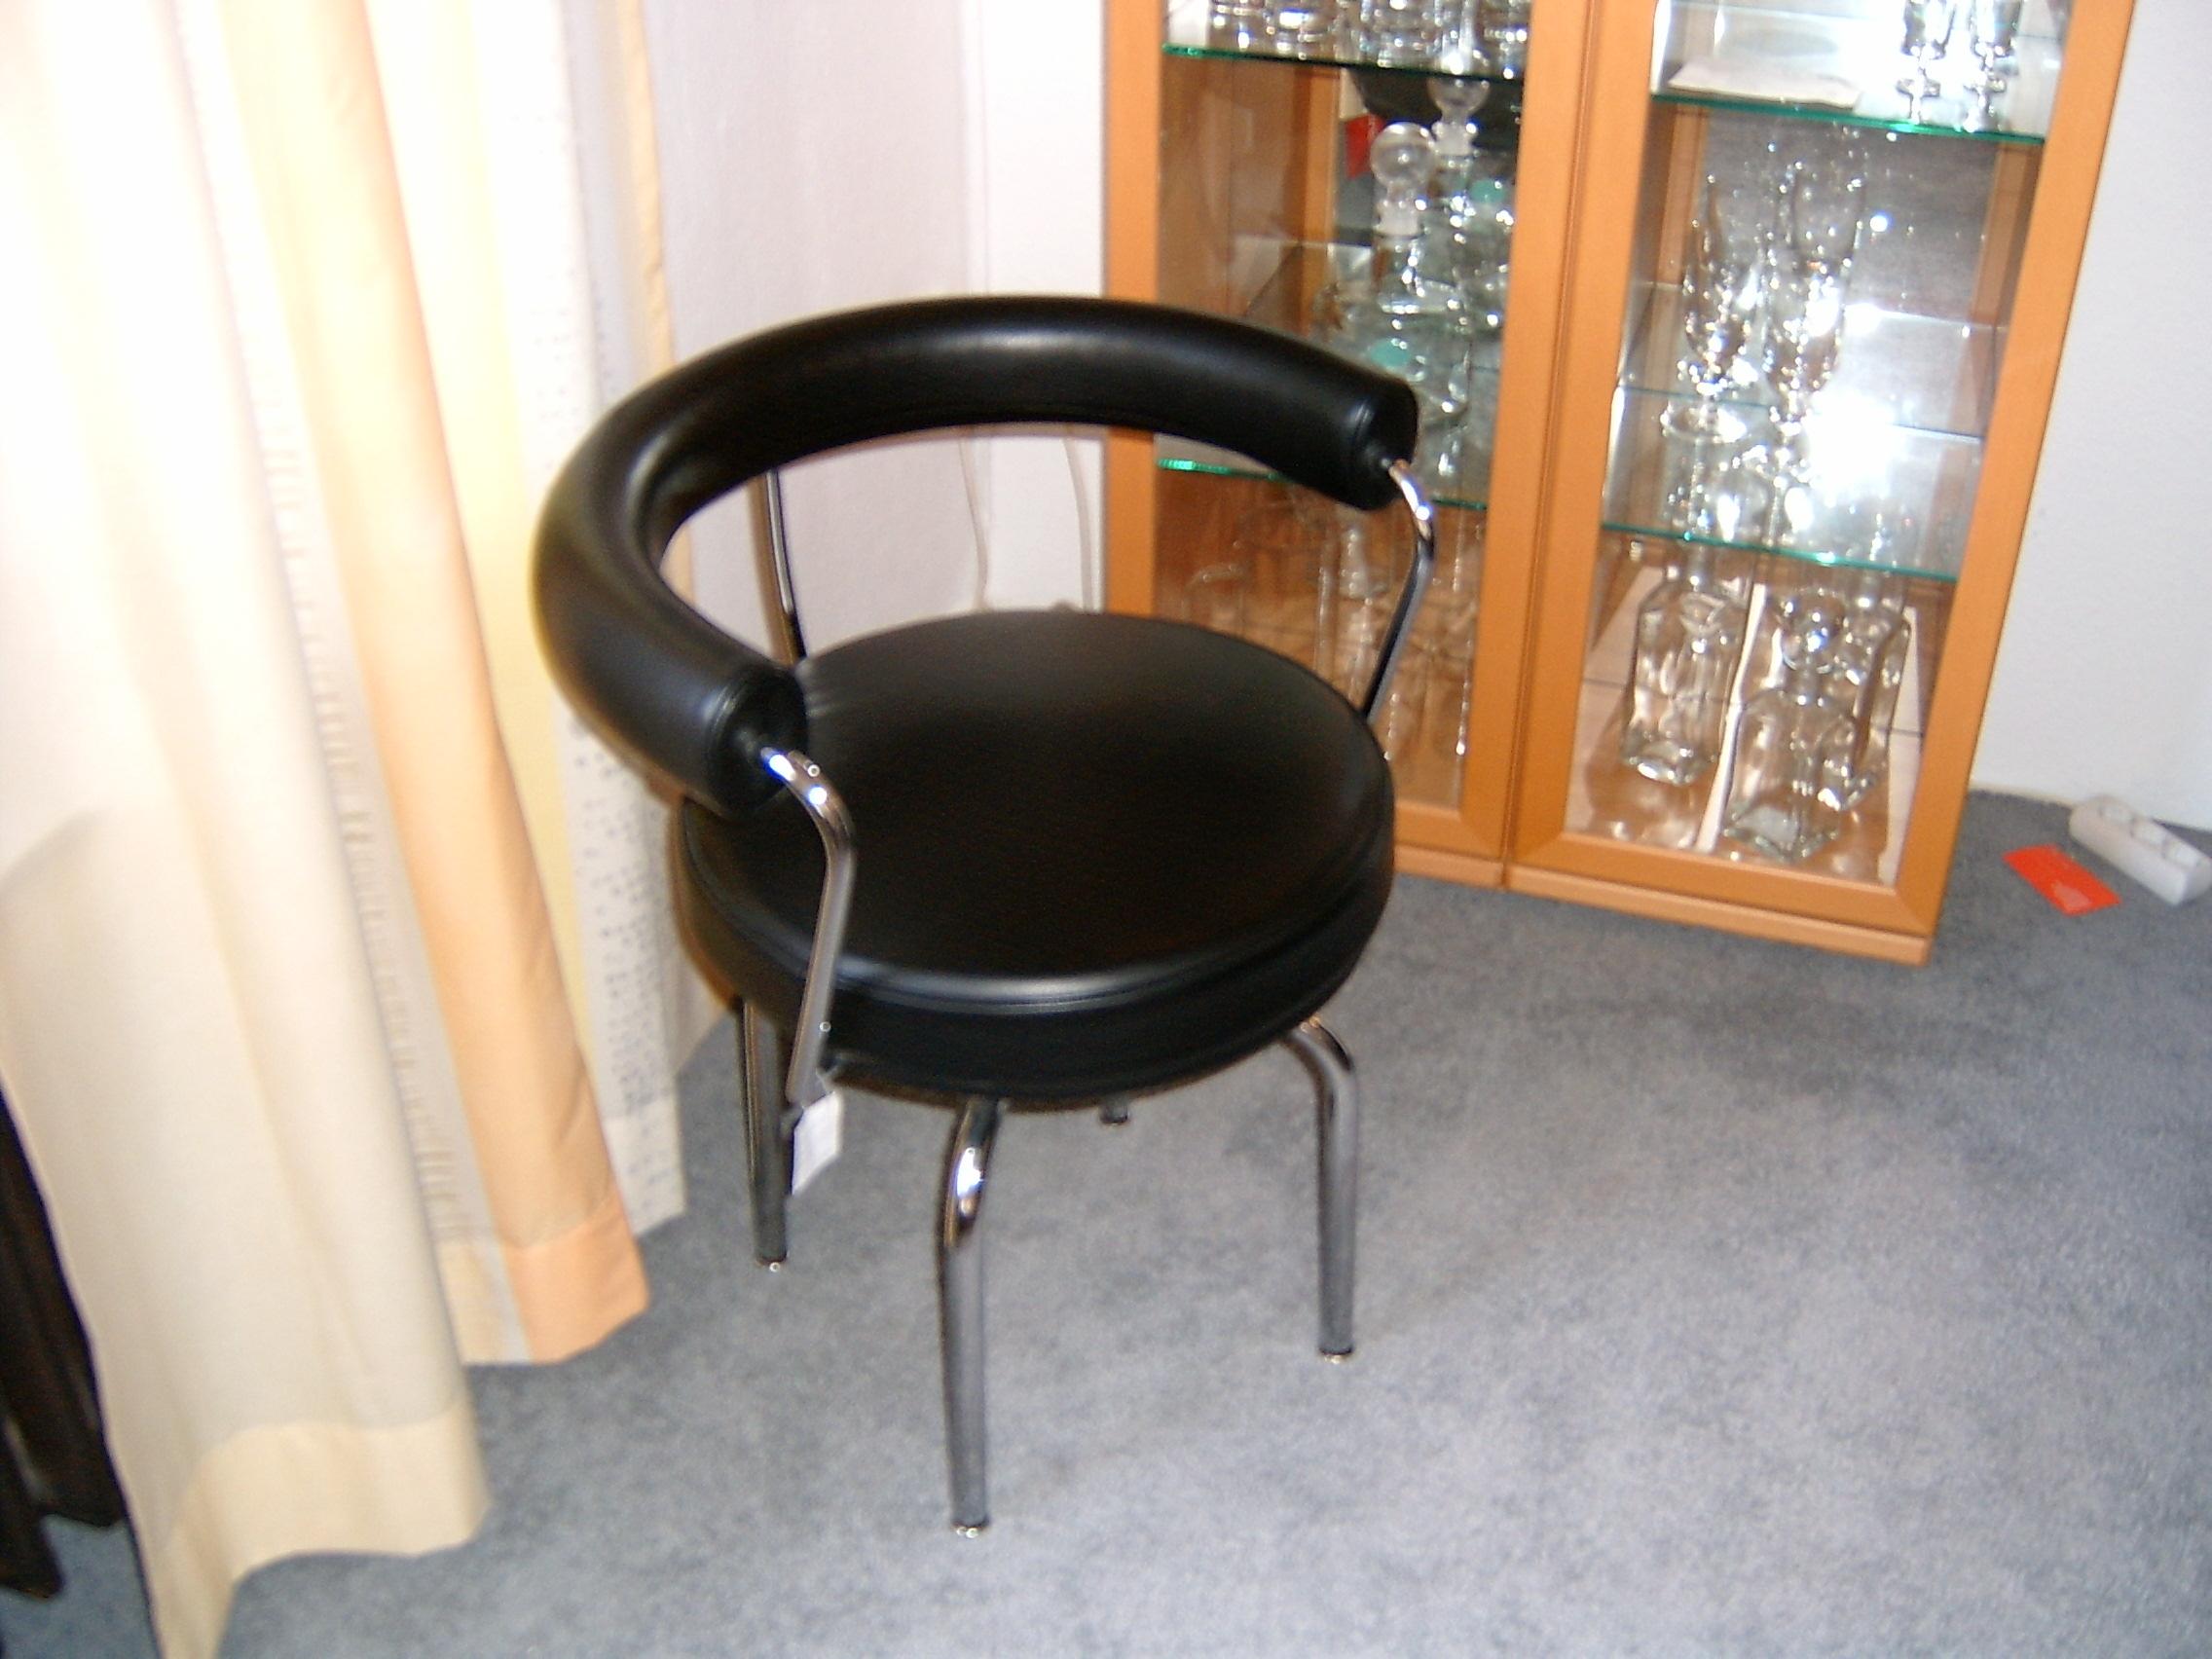 Rexing Kleve cassina drehstuhl modell lc 7 rexing einrichtungshaus in kleve